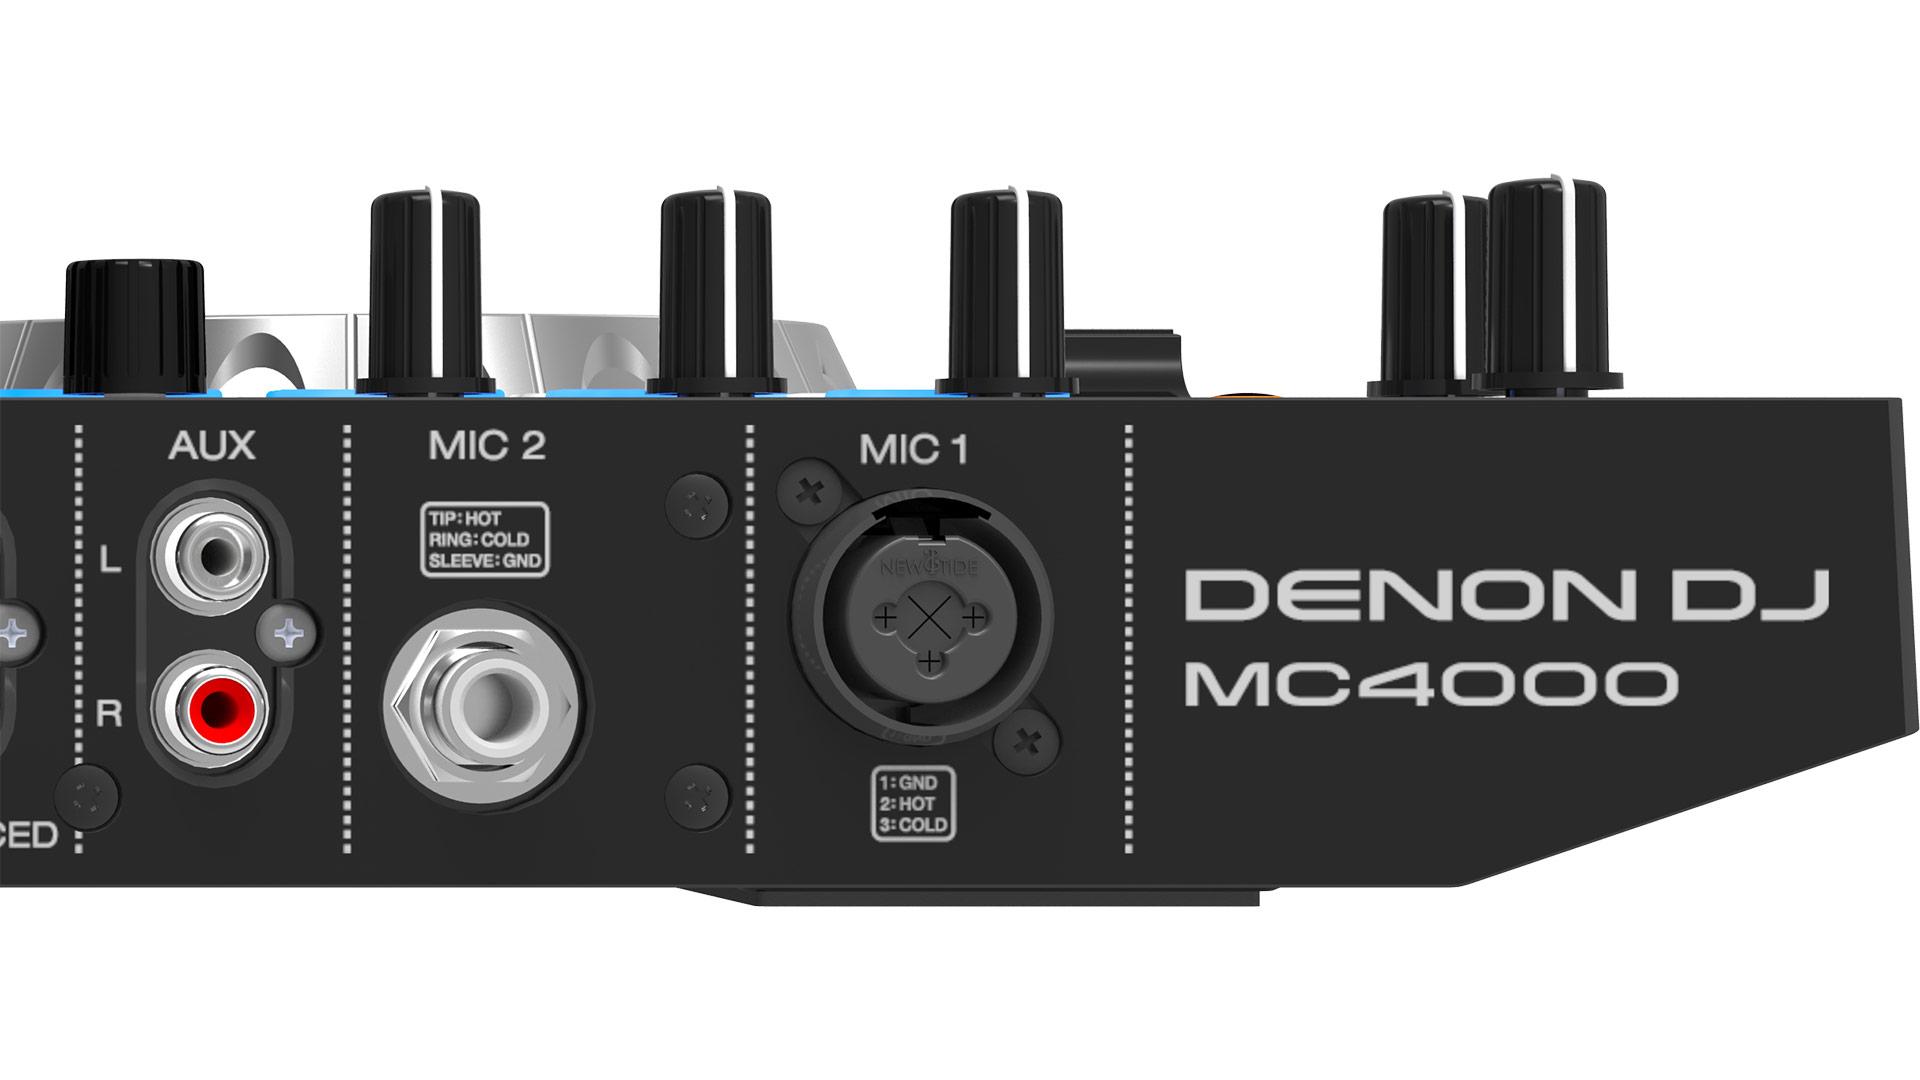 MC4000